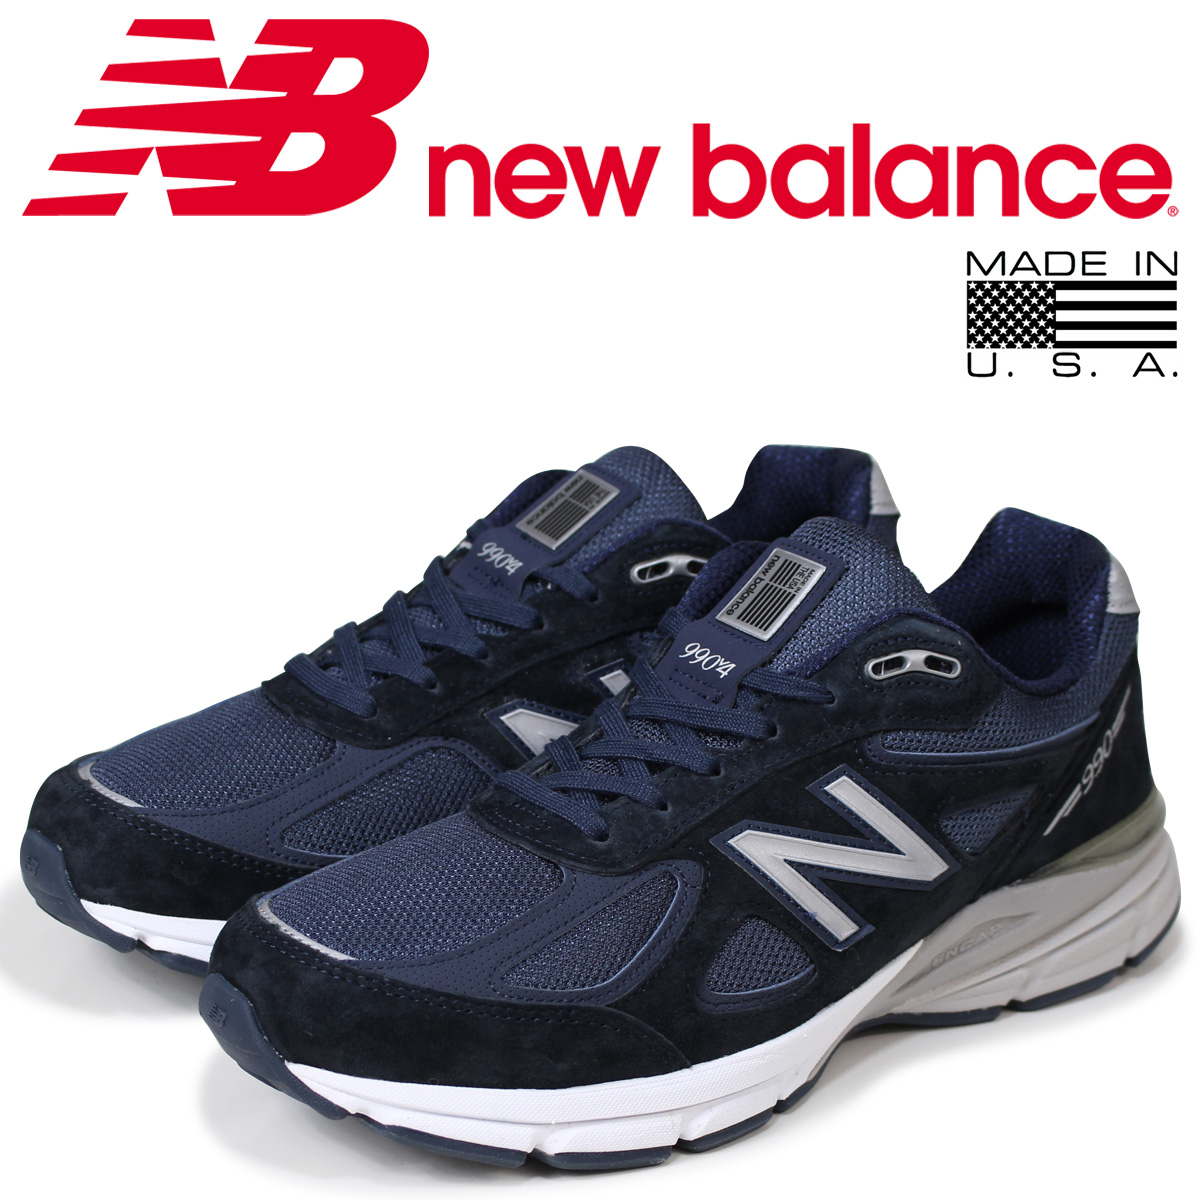 new balance m990nv4, OFF 78%,Buy!